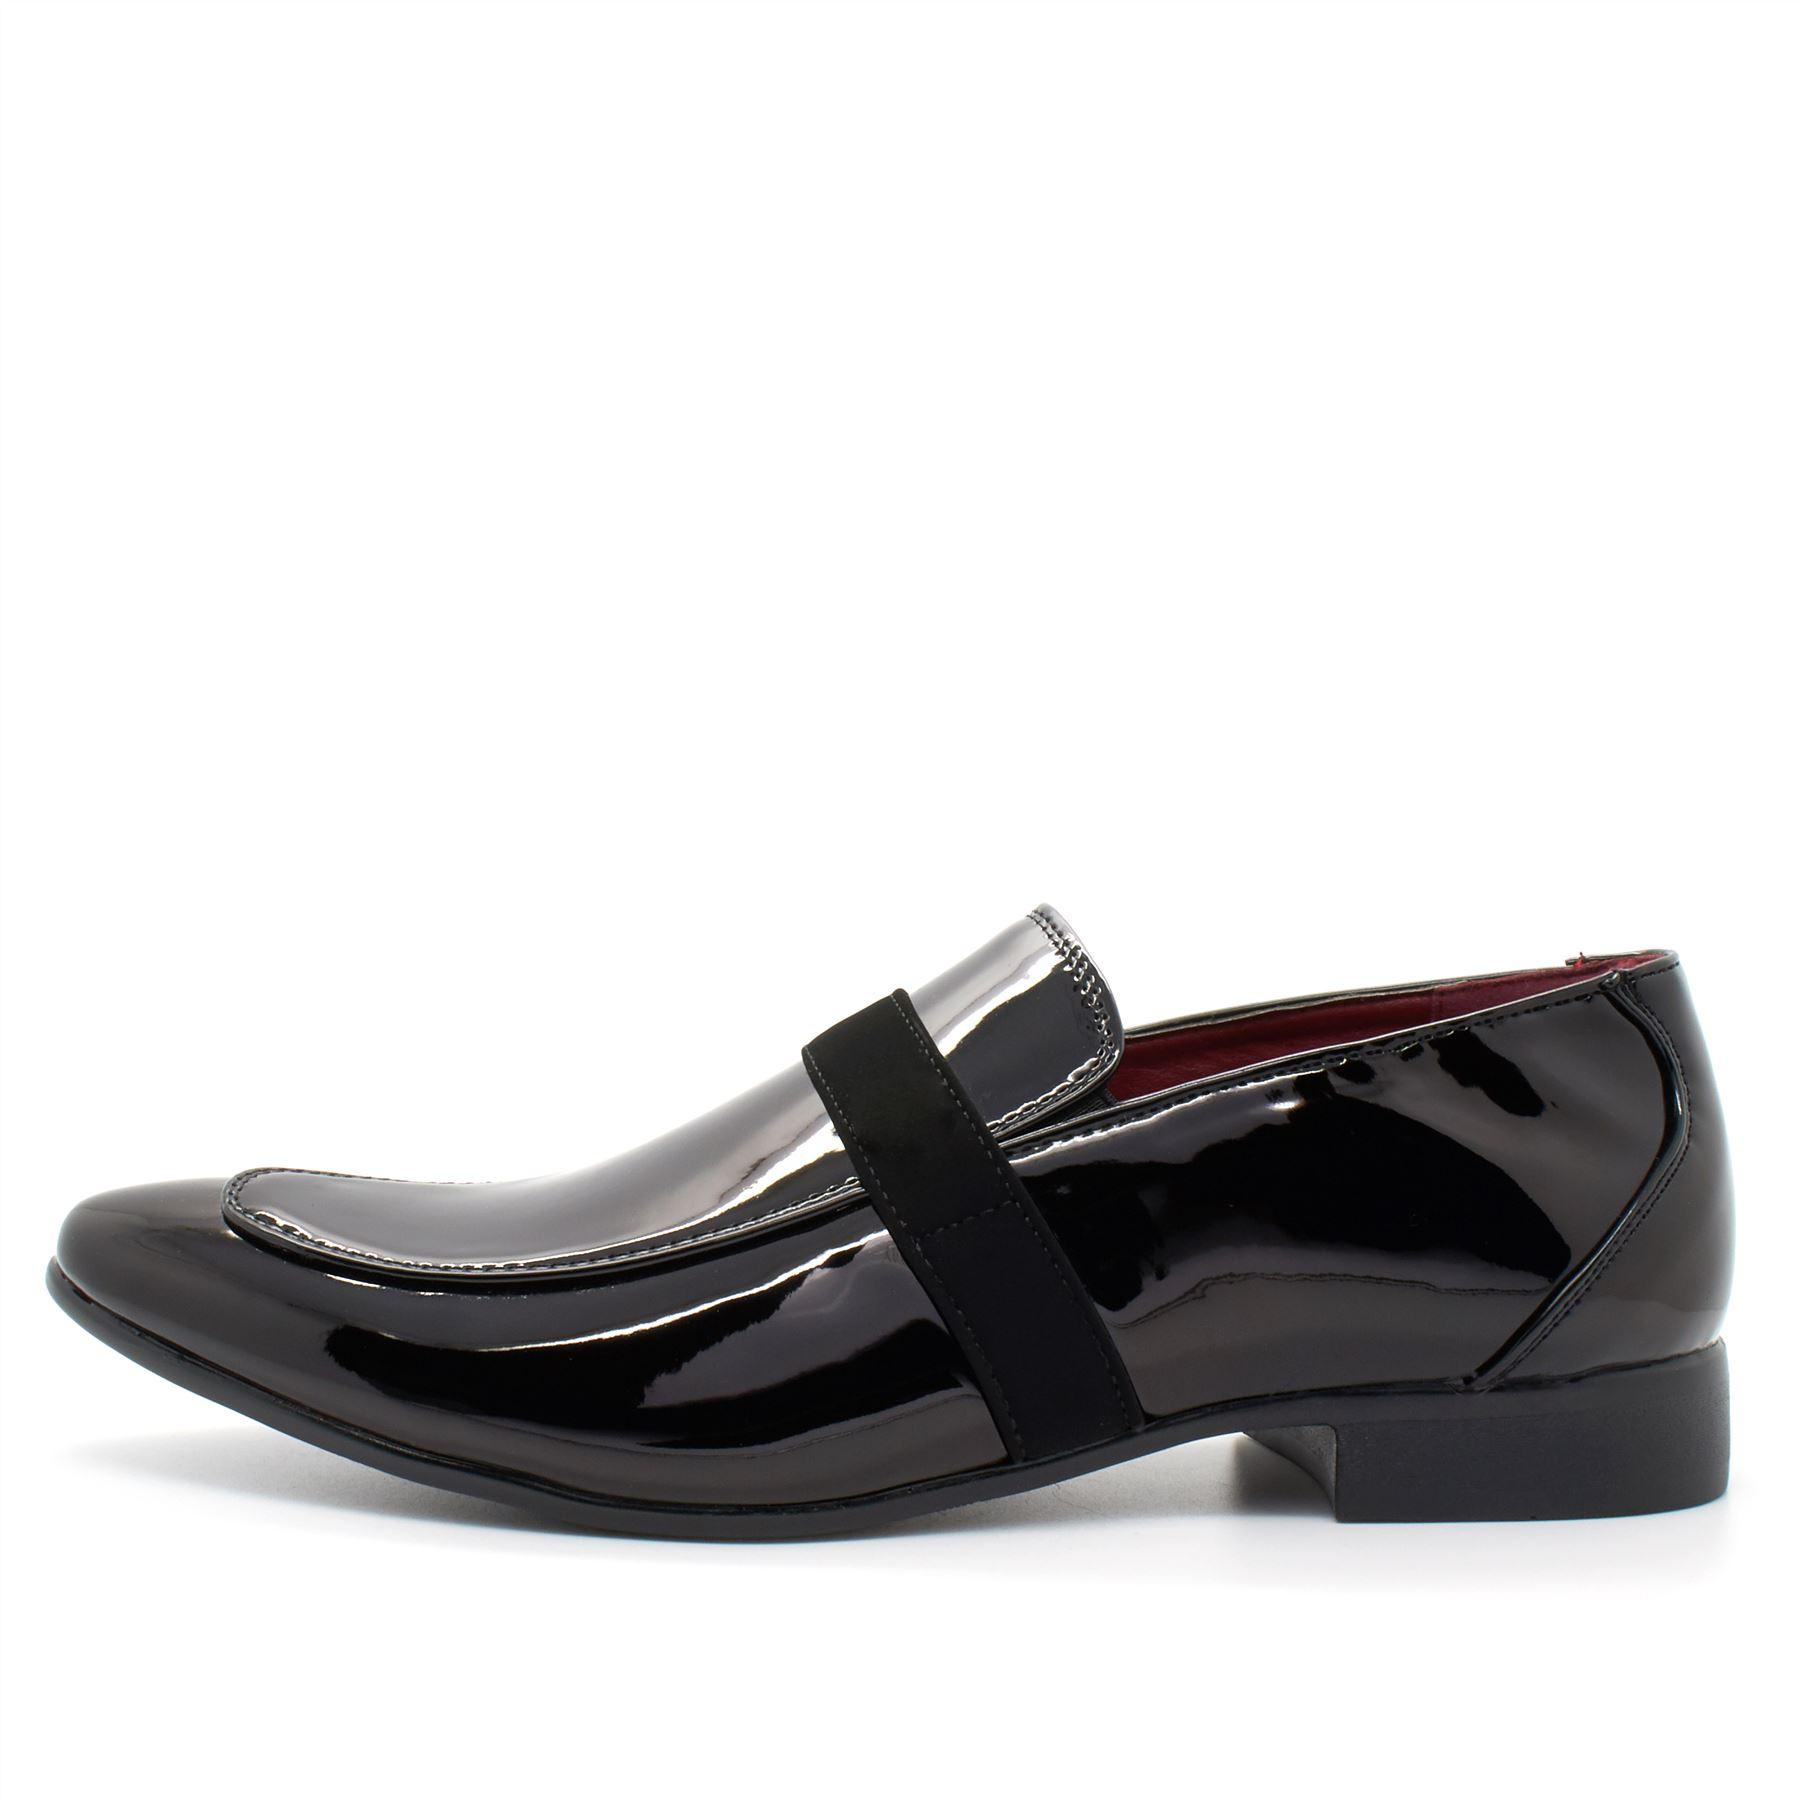 new mens italian style black patent leather shoes smart slip on formal shiny uk ebay